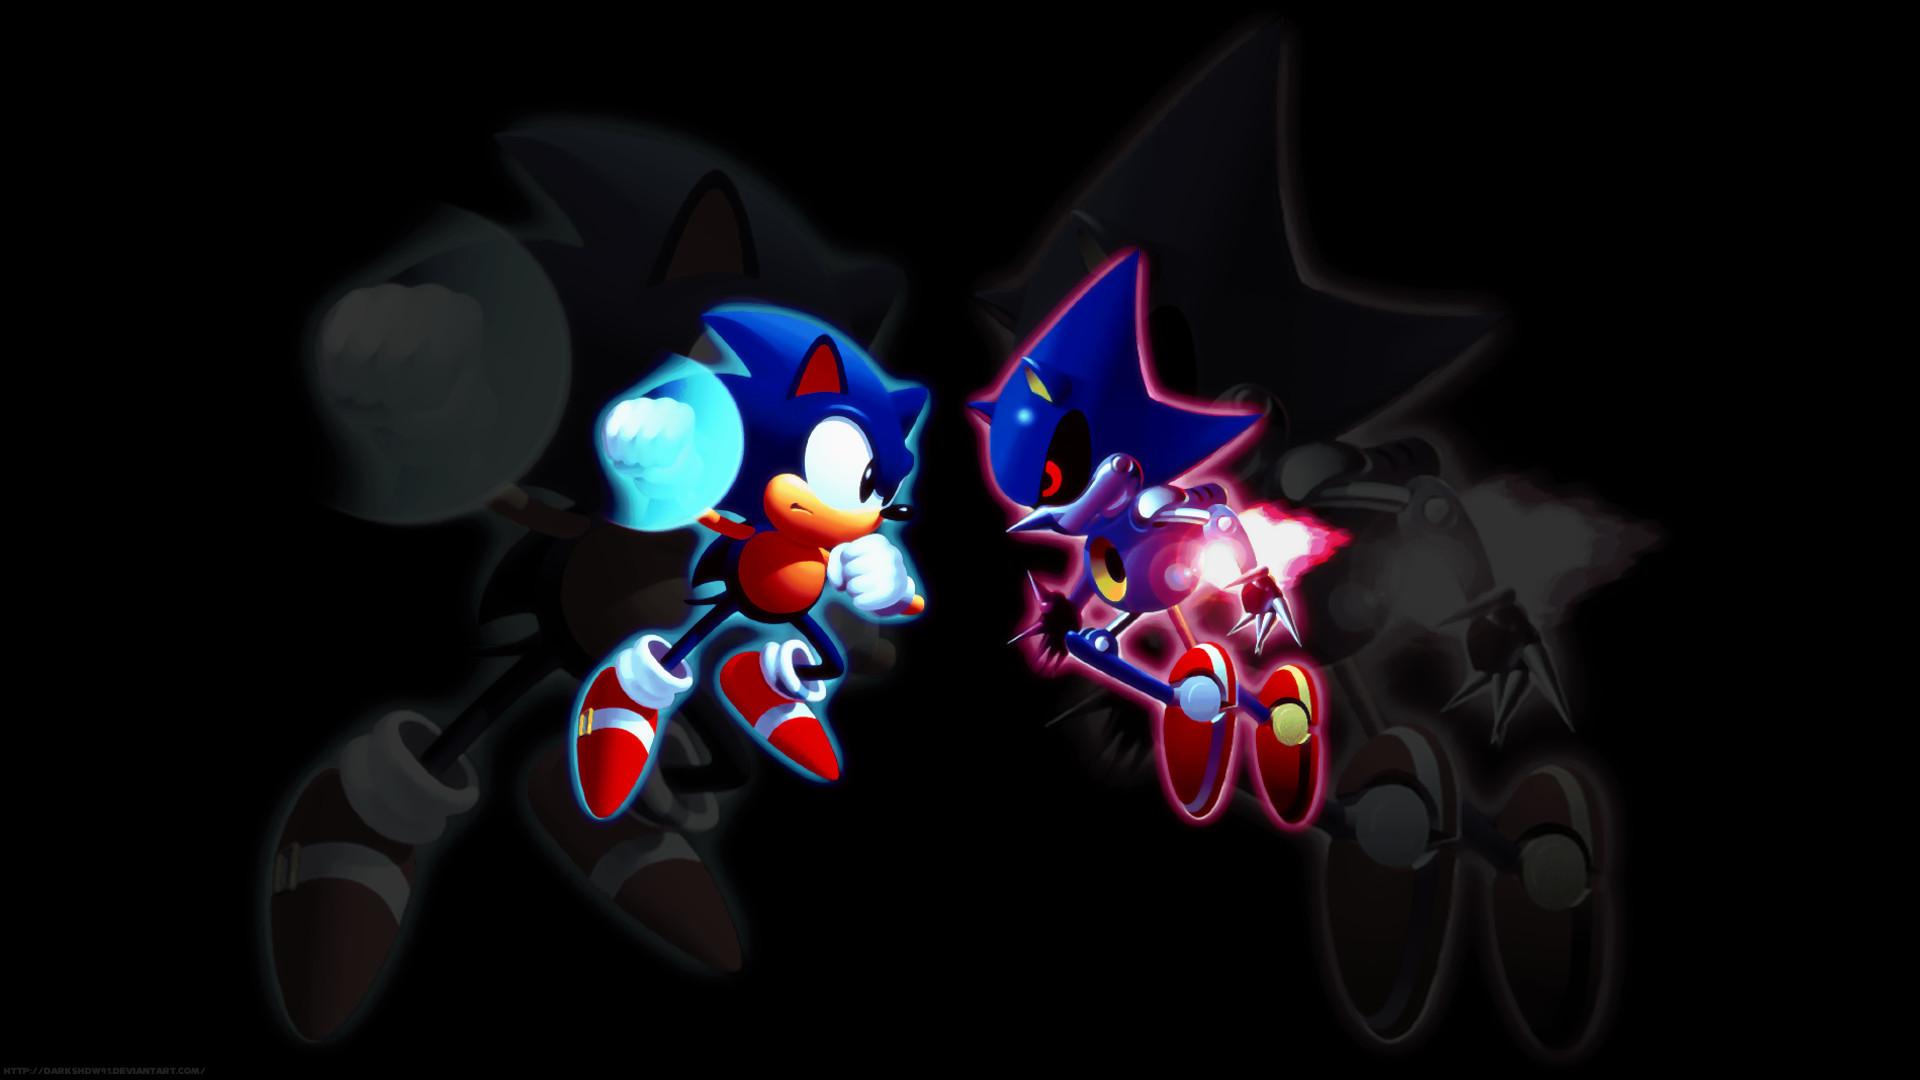 Sonic Vs. Metal Sonic by DarkShdw91 on DeviantArt